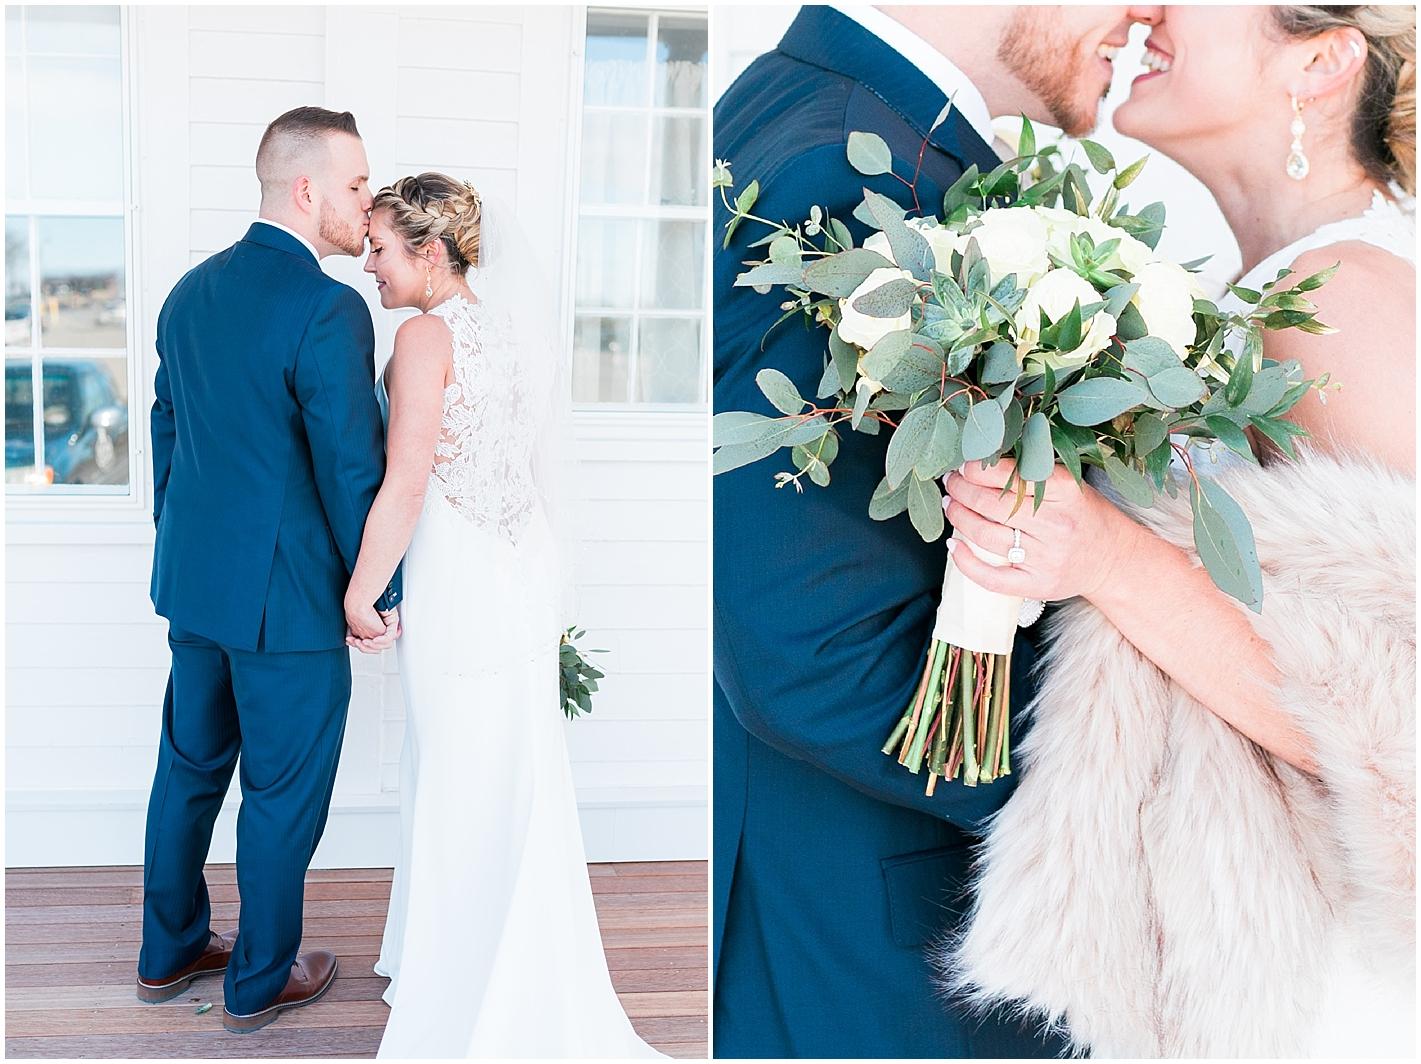 White Rose Bridal Bouquet Photos by Alyssa Parker Photography